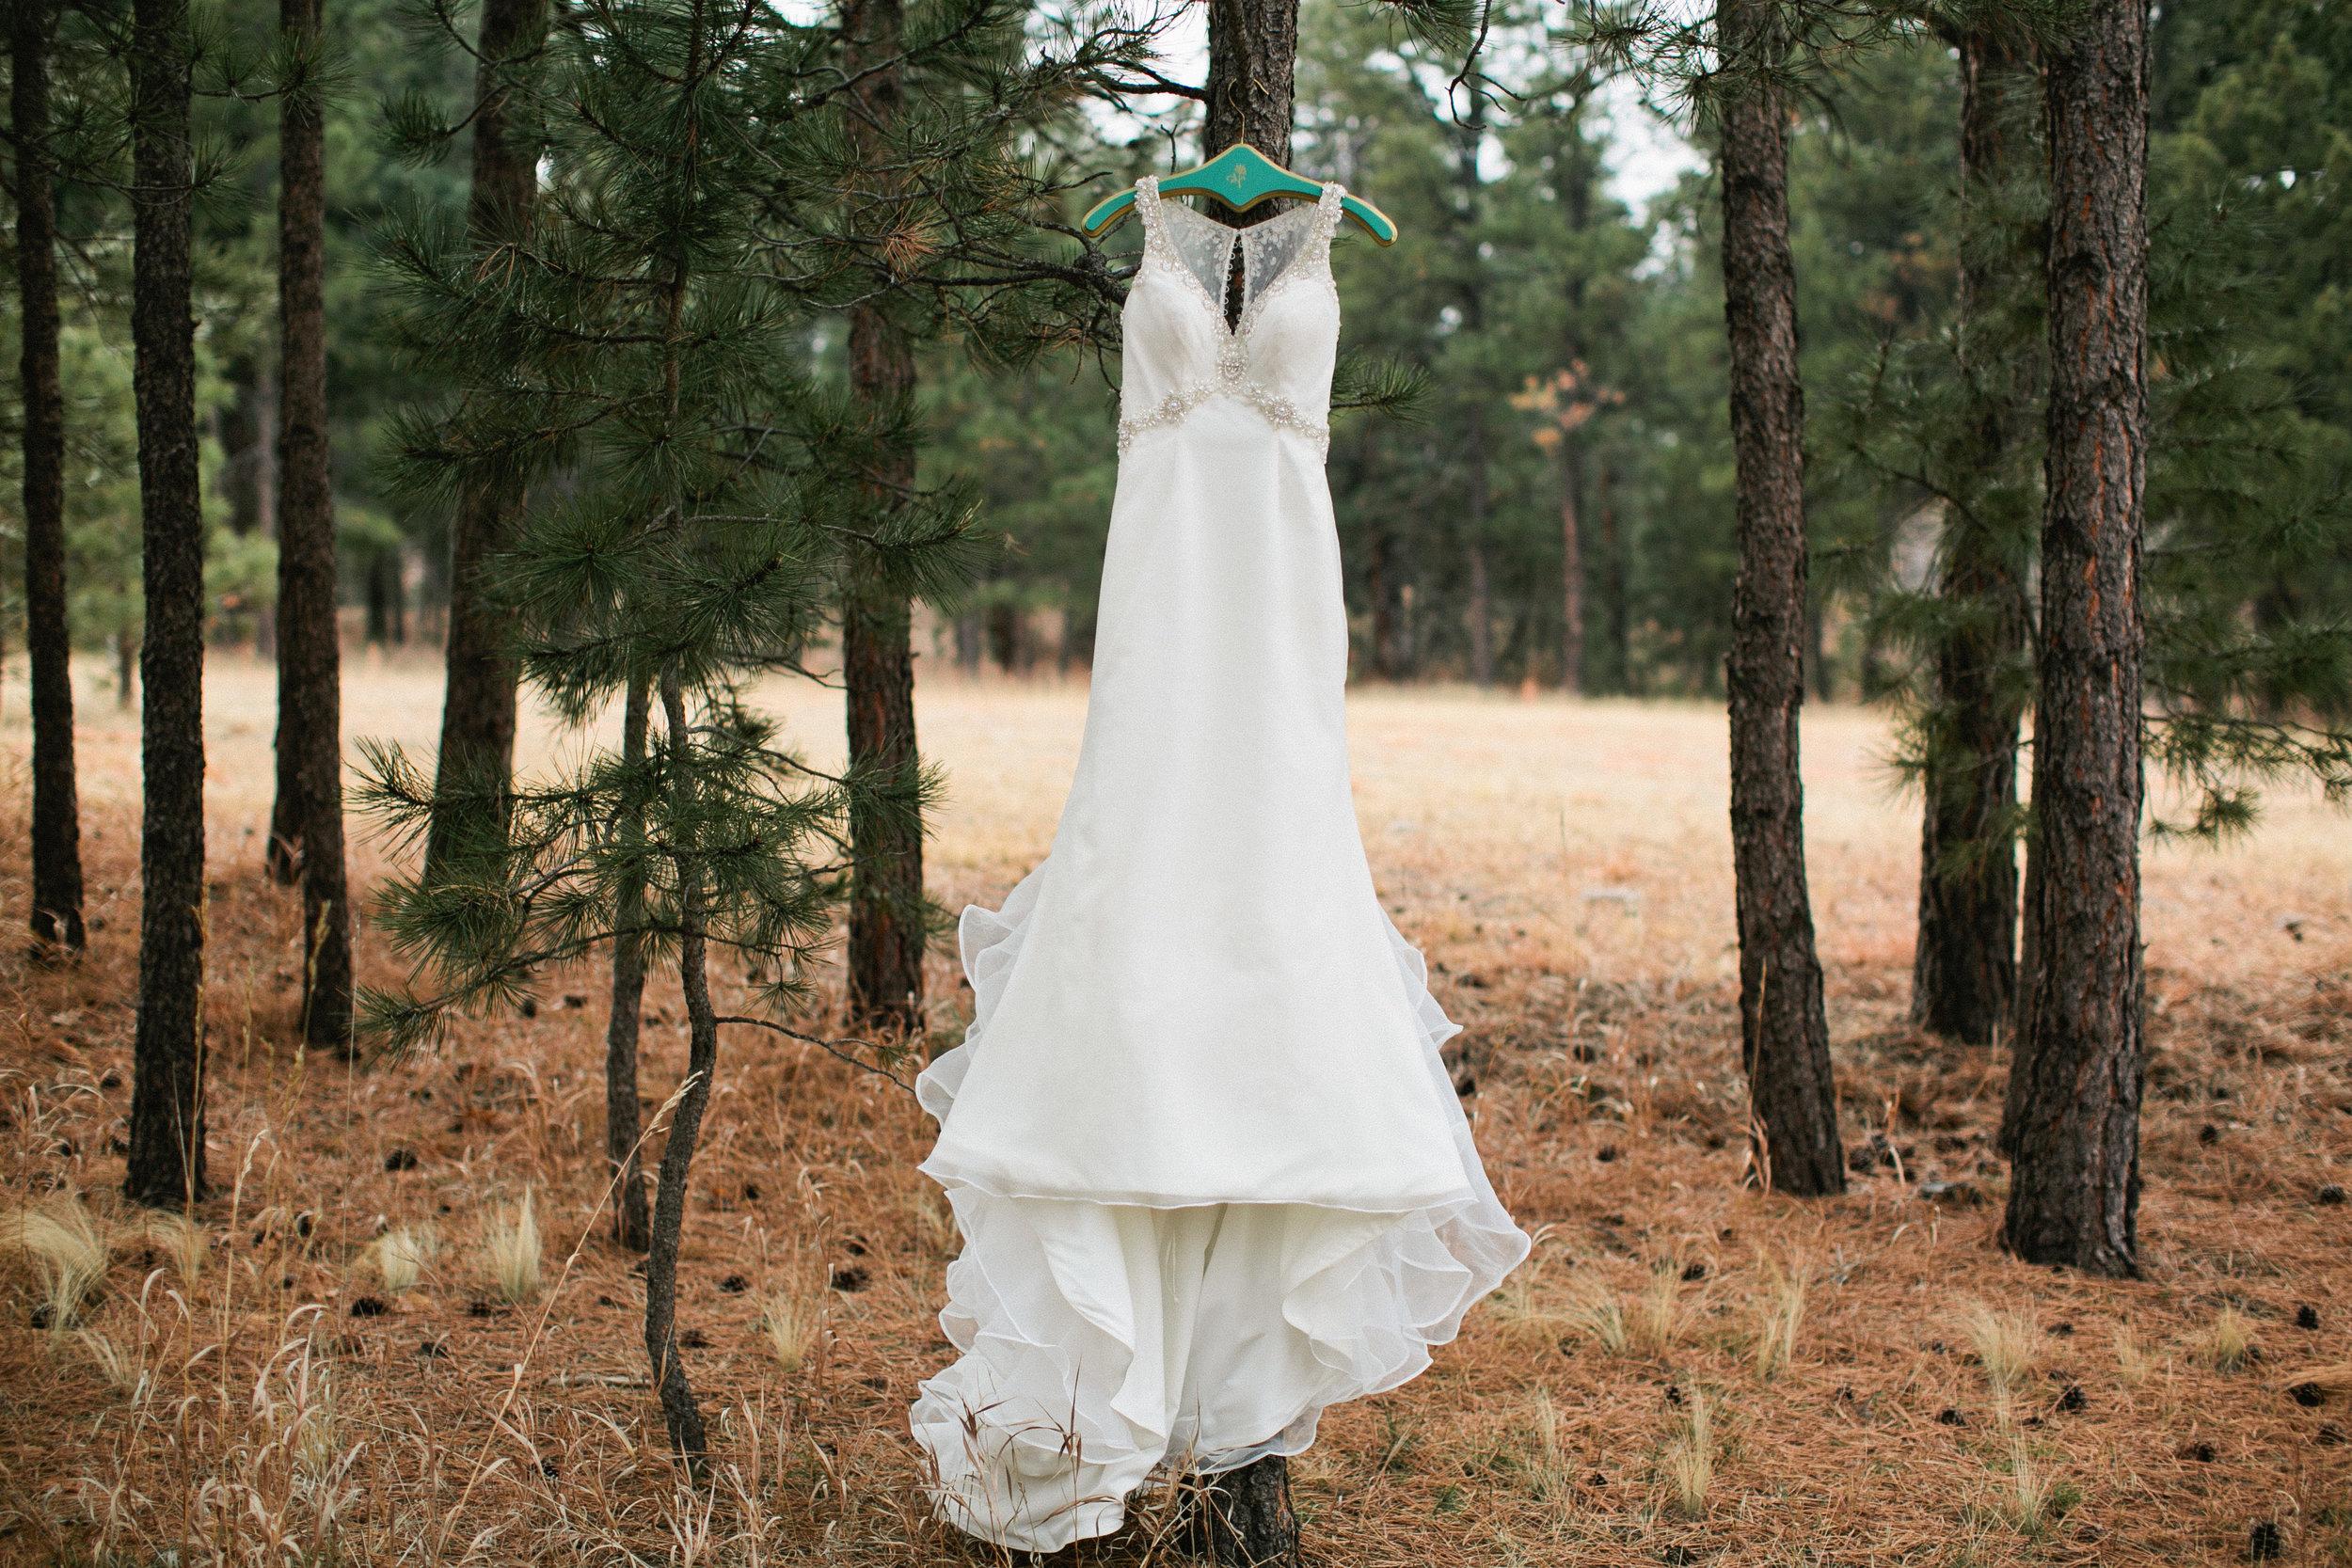 Iowa wedding dresses, bridal shops, and bridal accessories